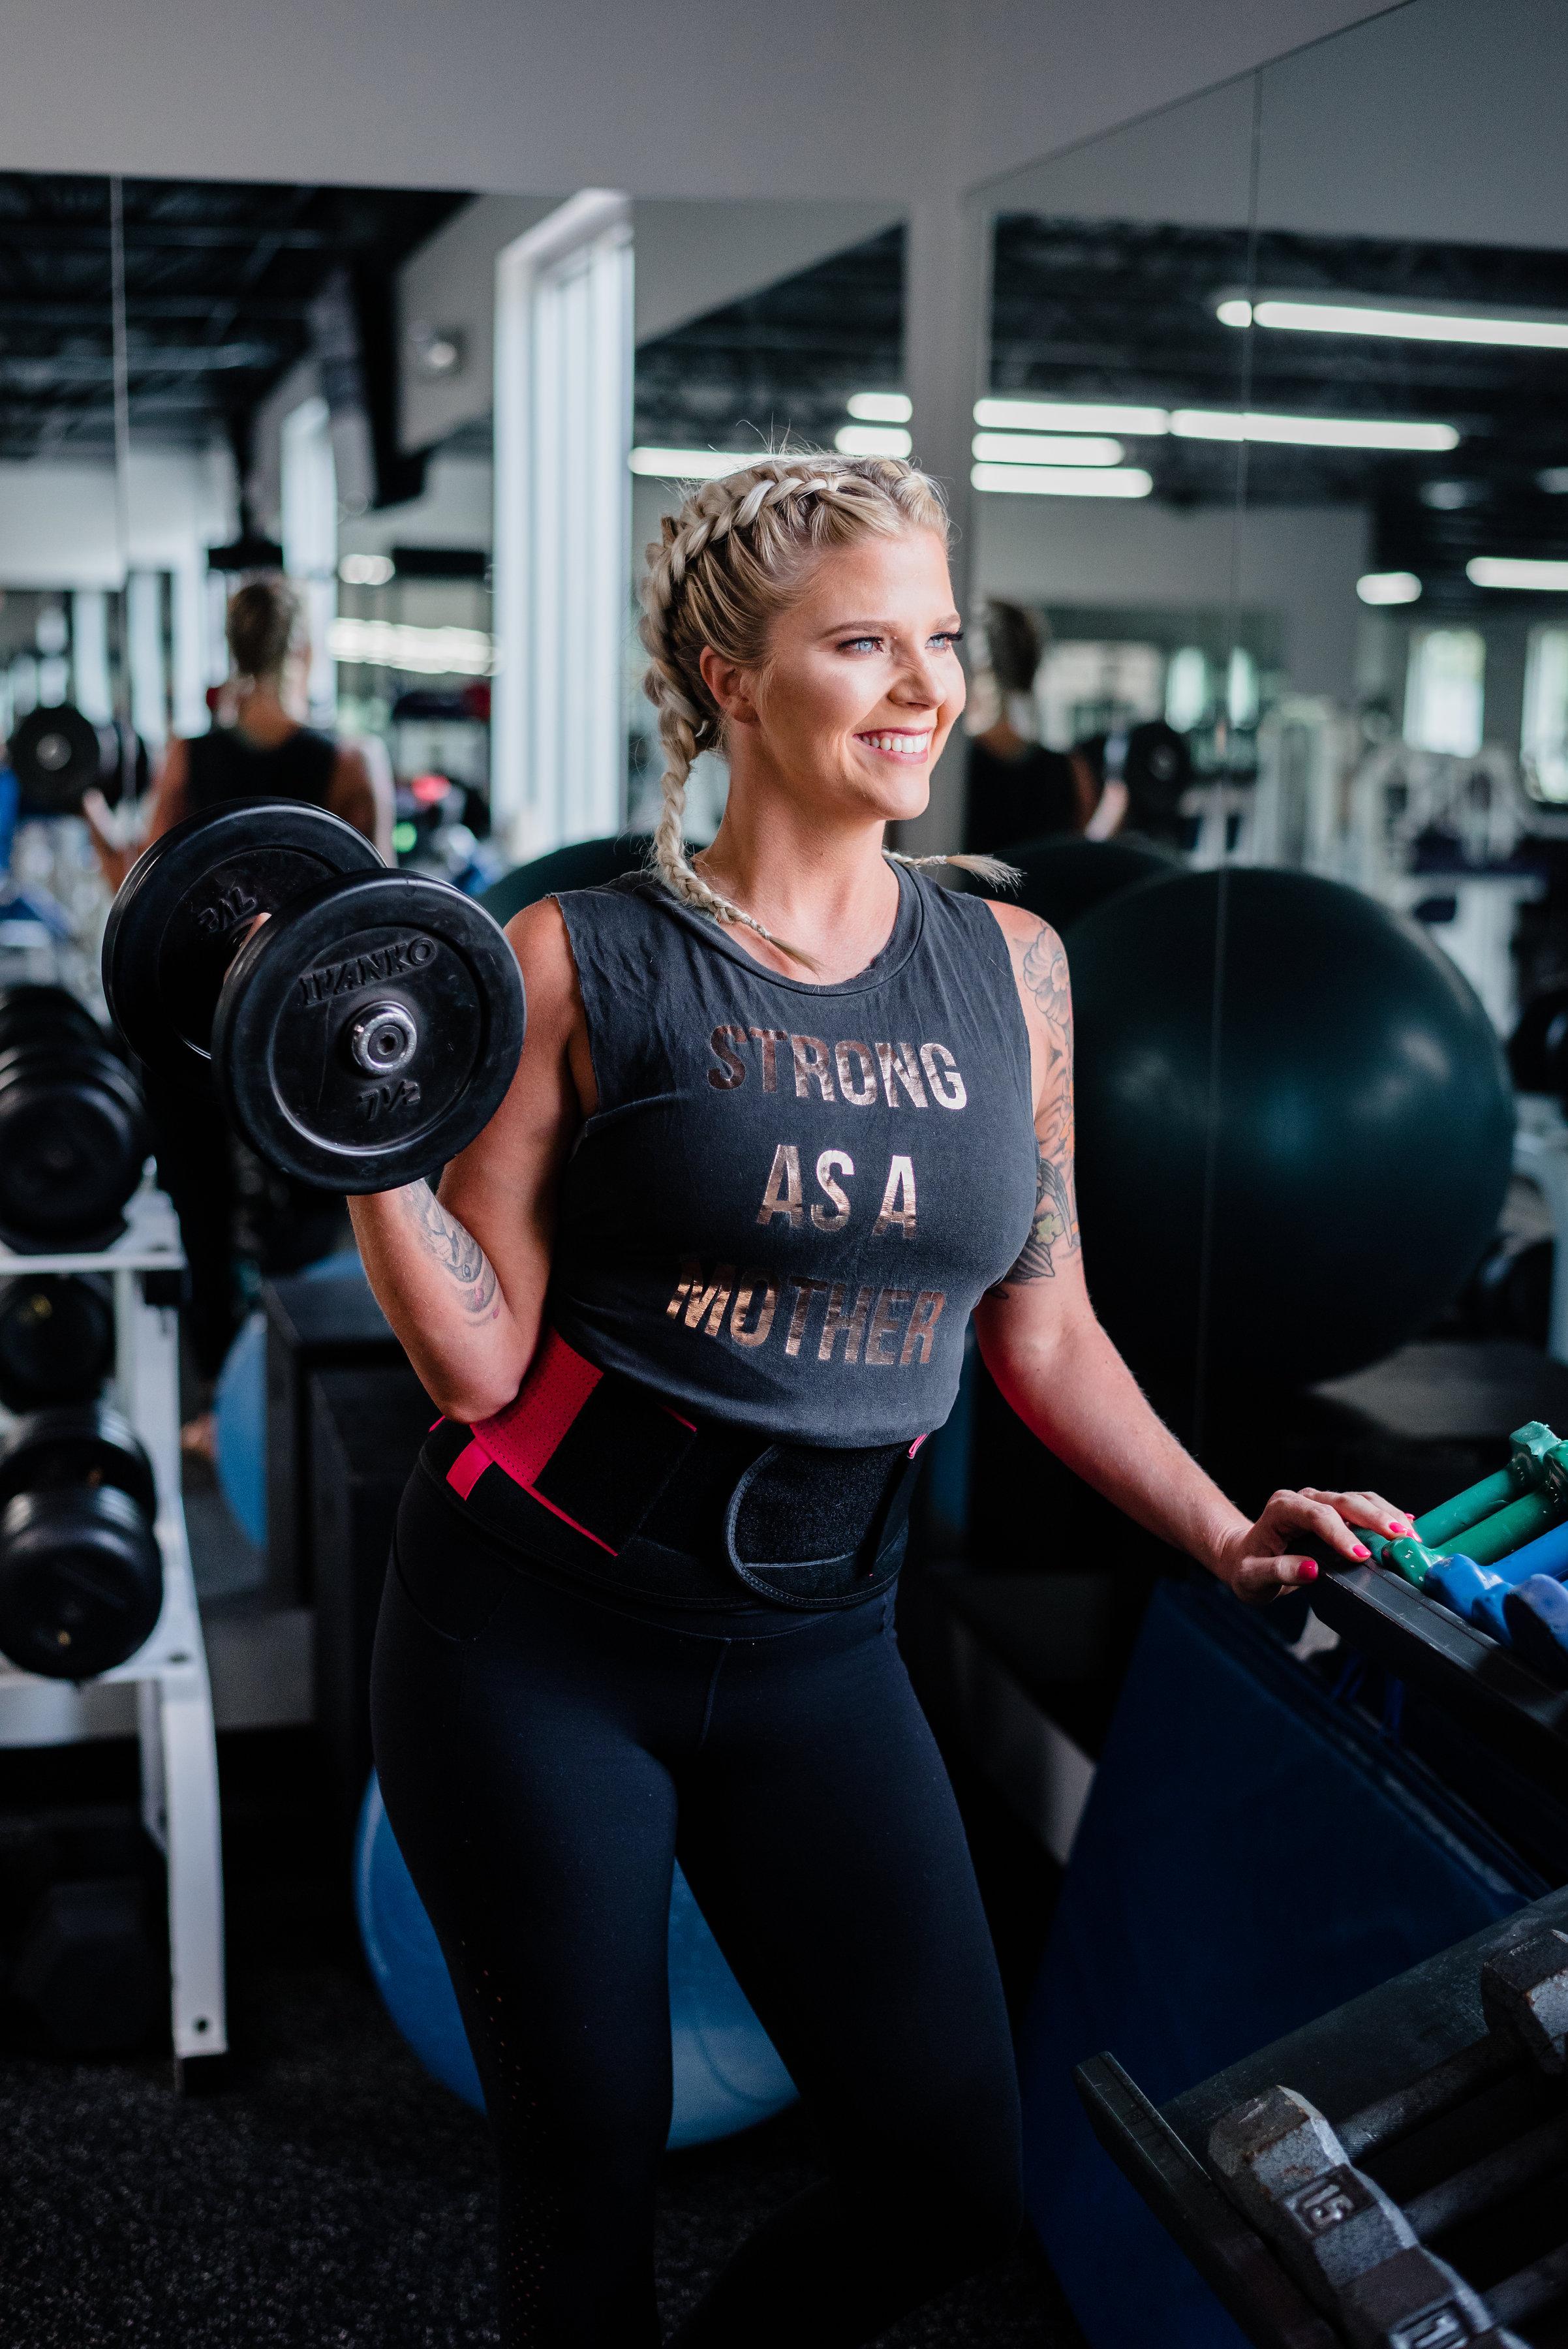 Lisa_workout-4.jpg